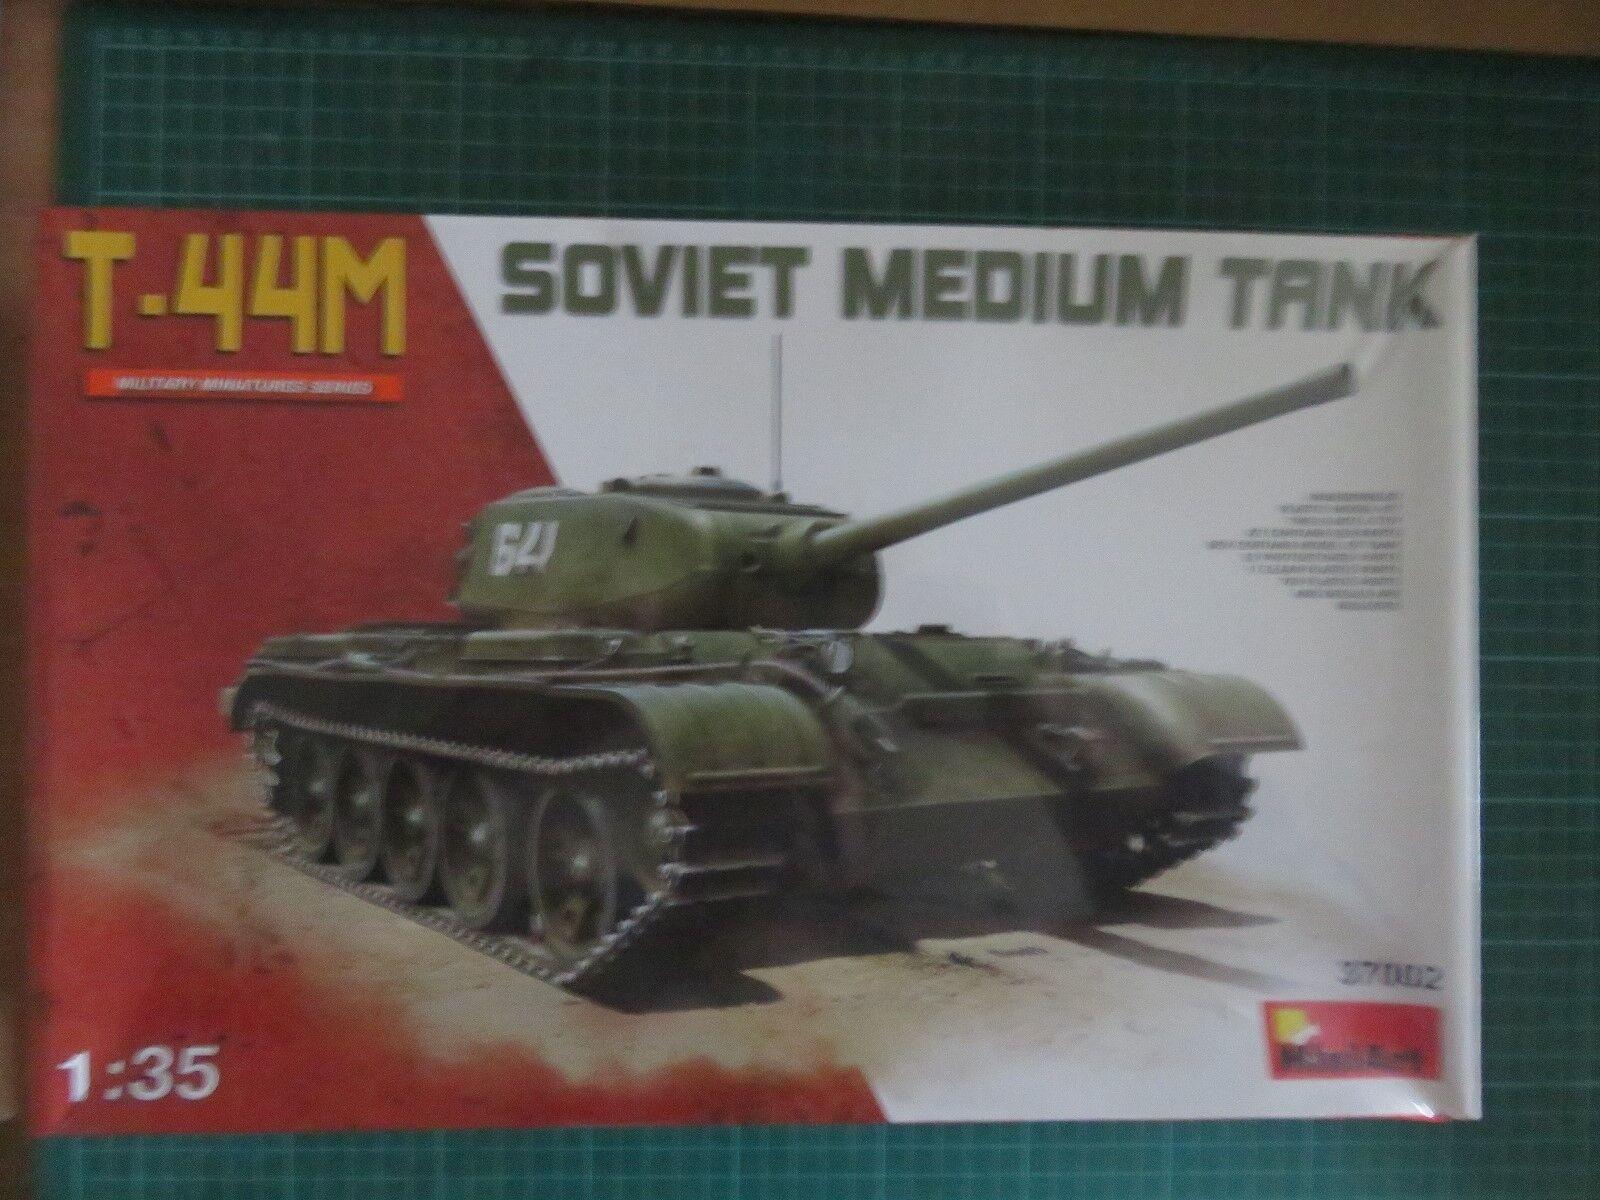 Miniart 1 35 scale T-44M Soviet Medium Tank